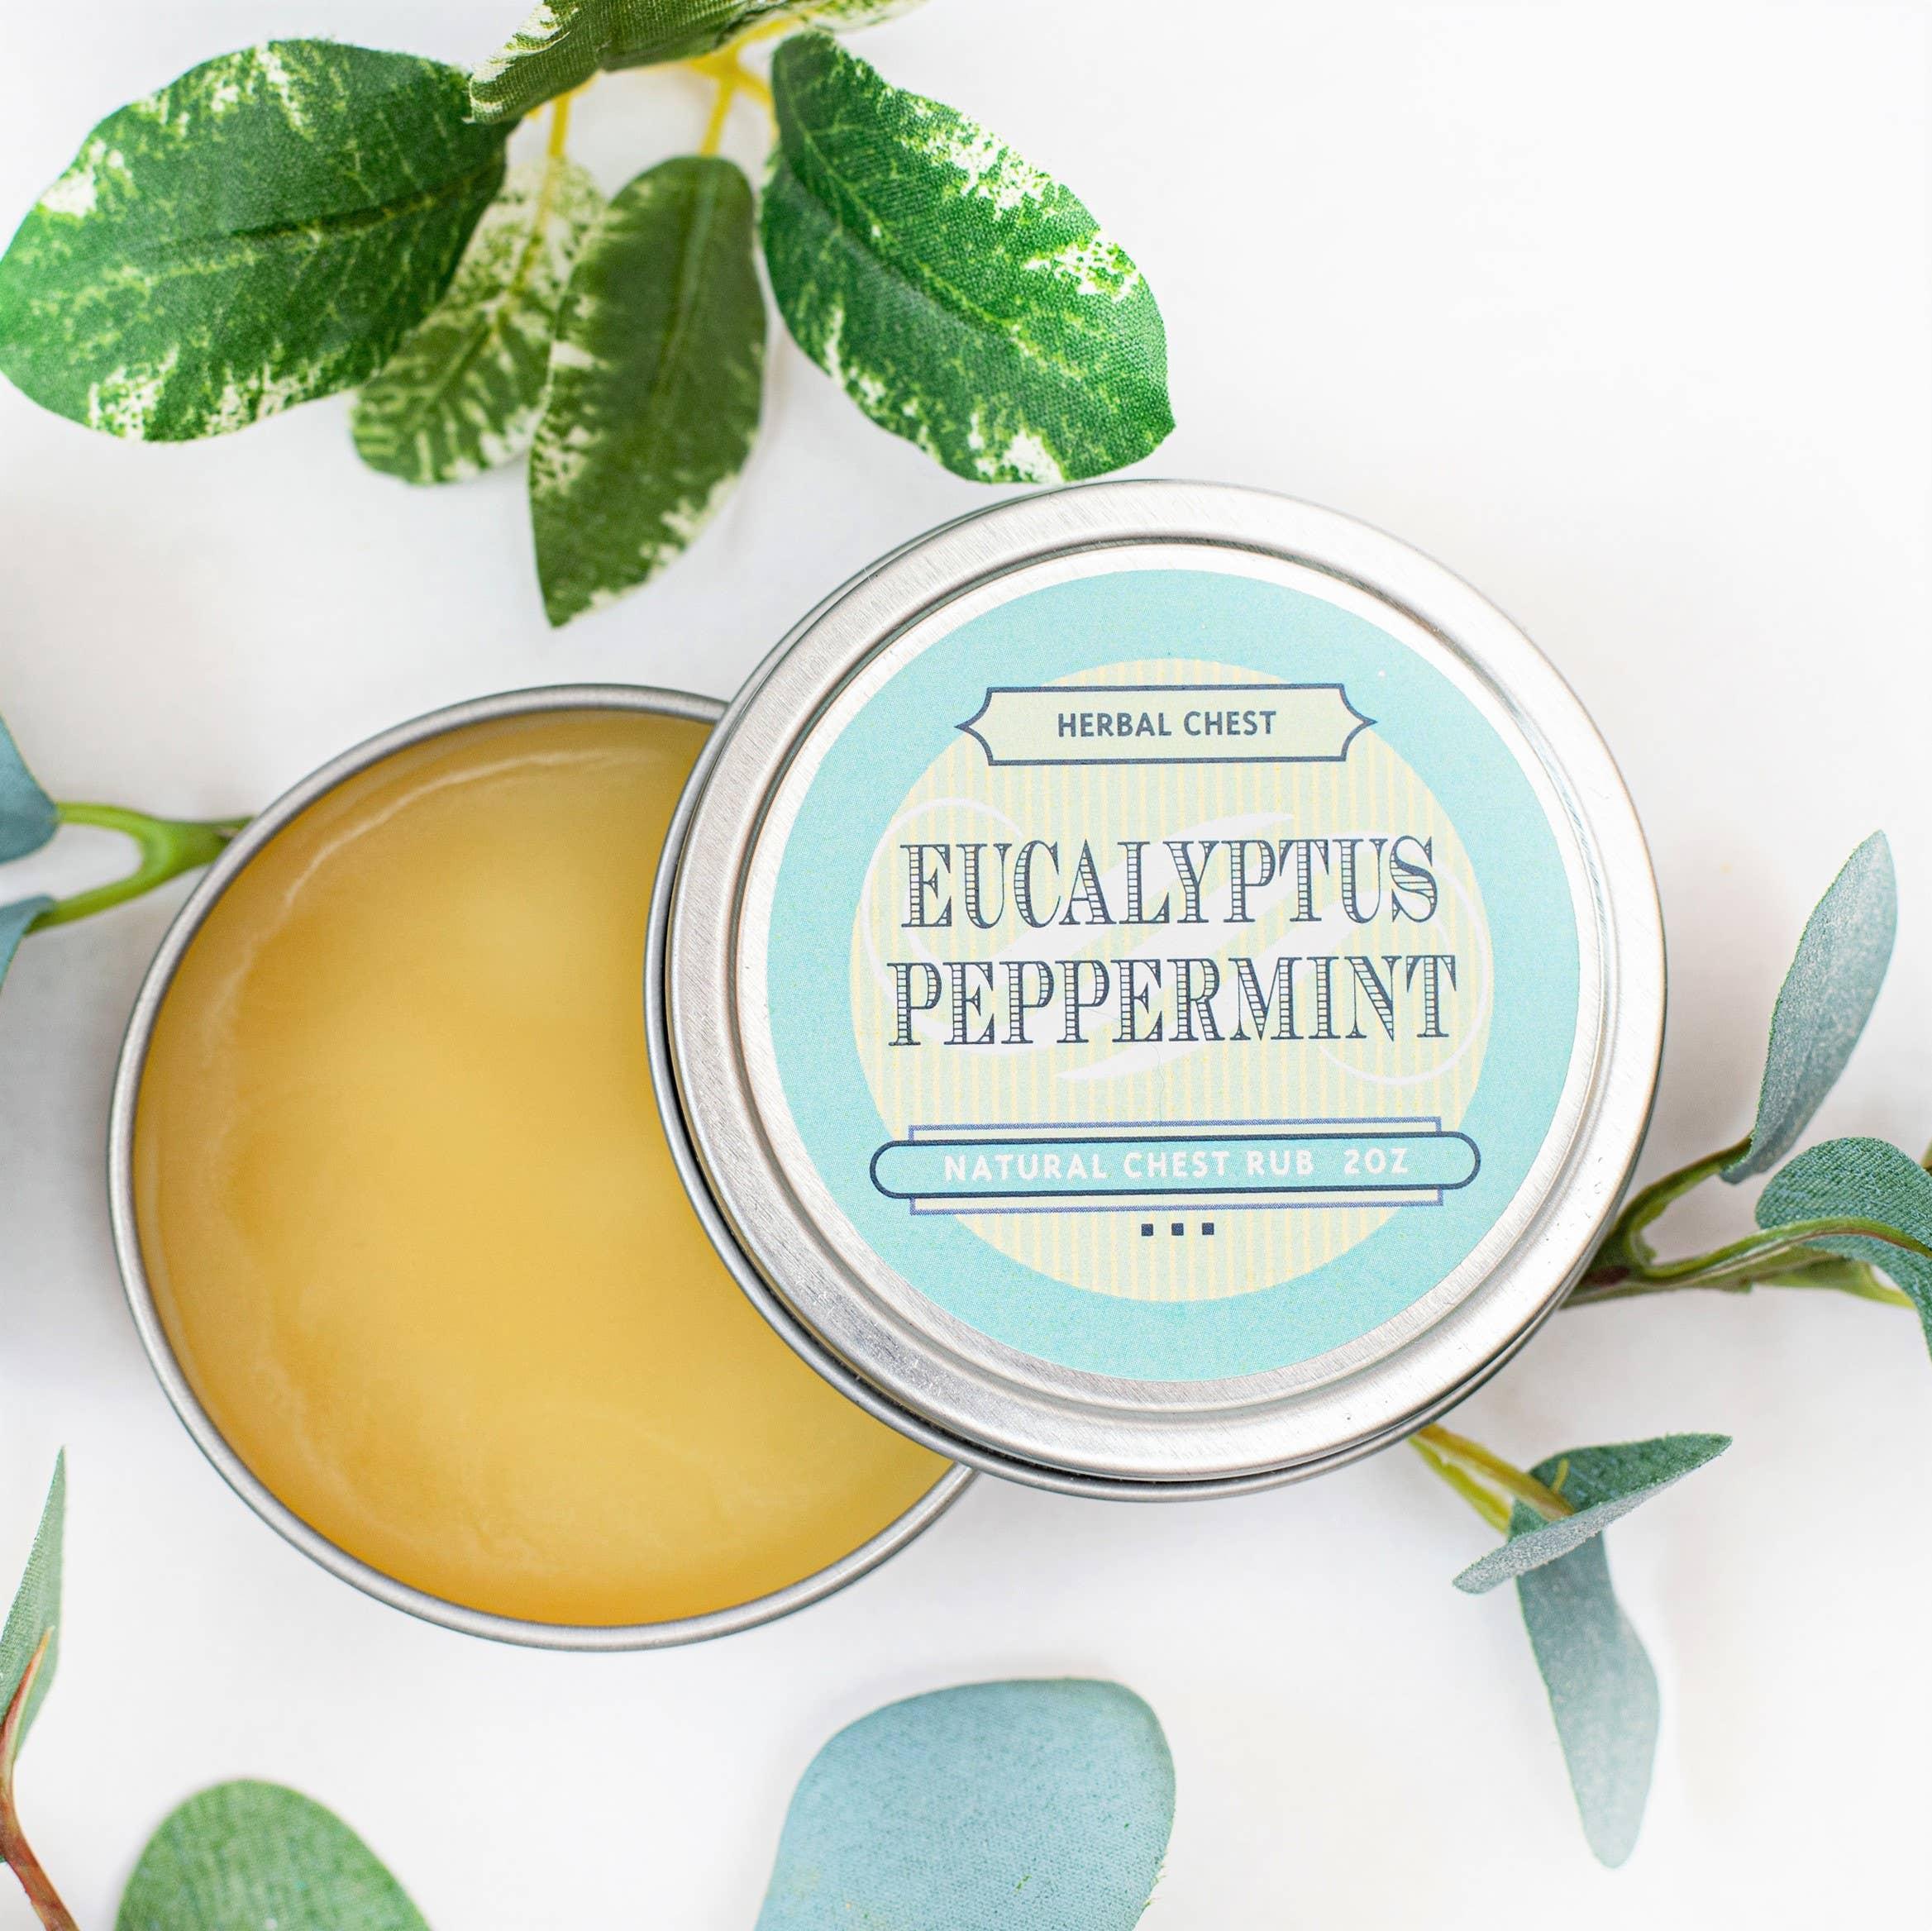 Natural Vapor Chest Rub - Eucalyptus Peppermint Salve | Trada Marketplace